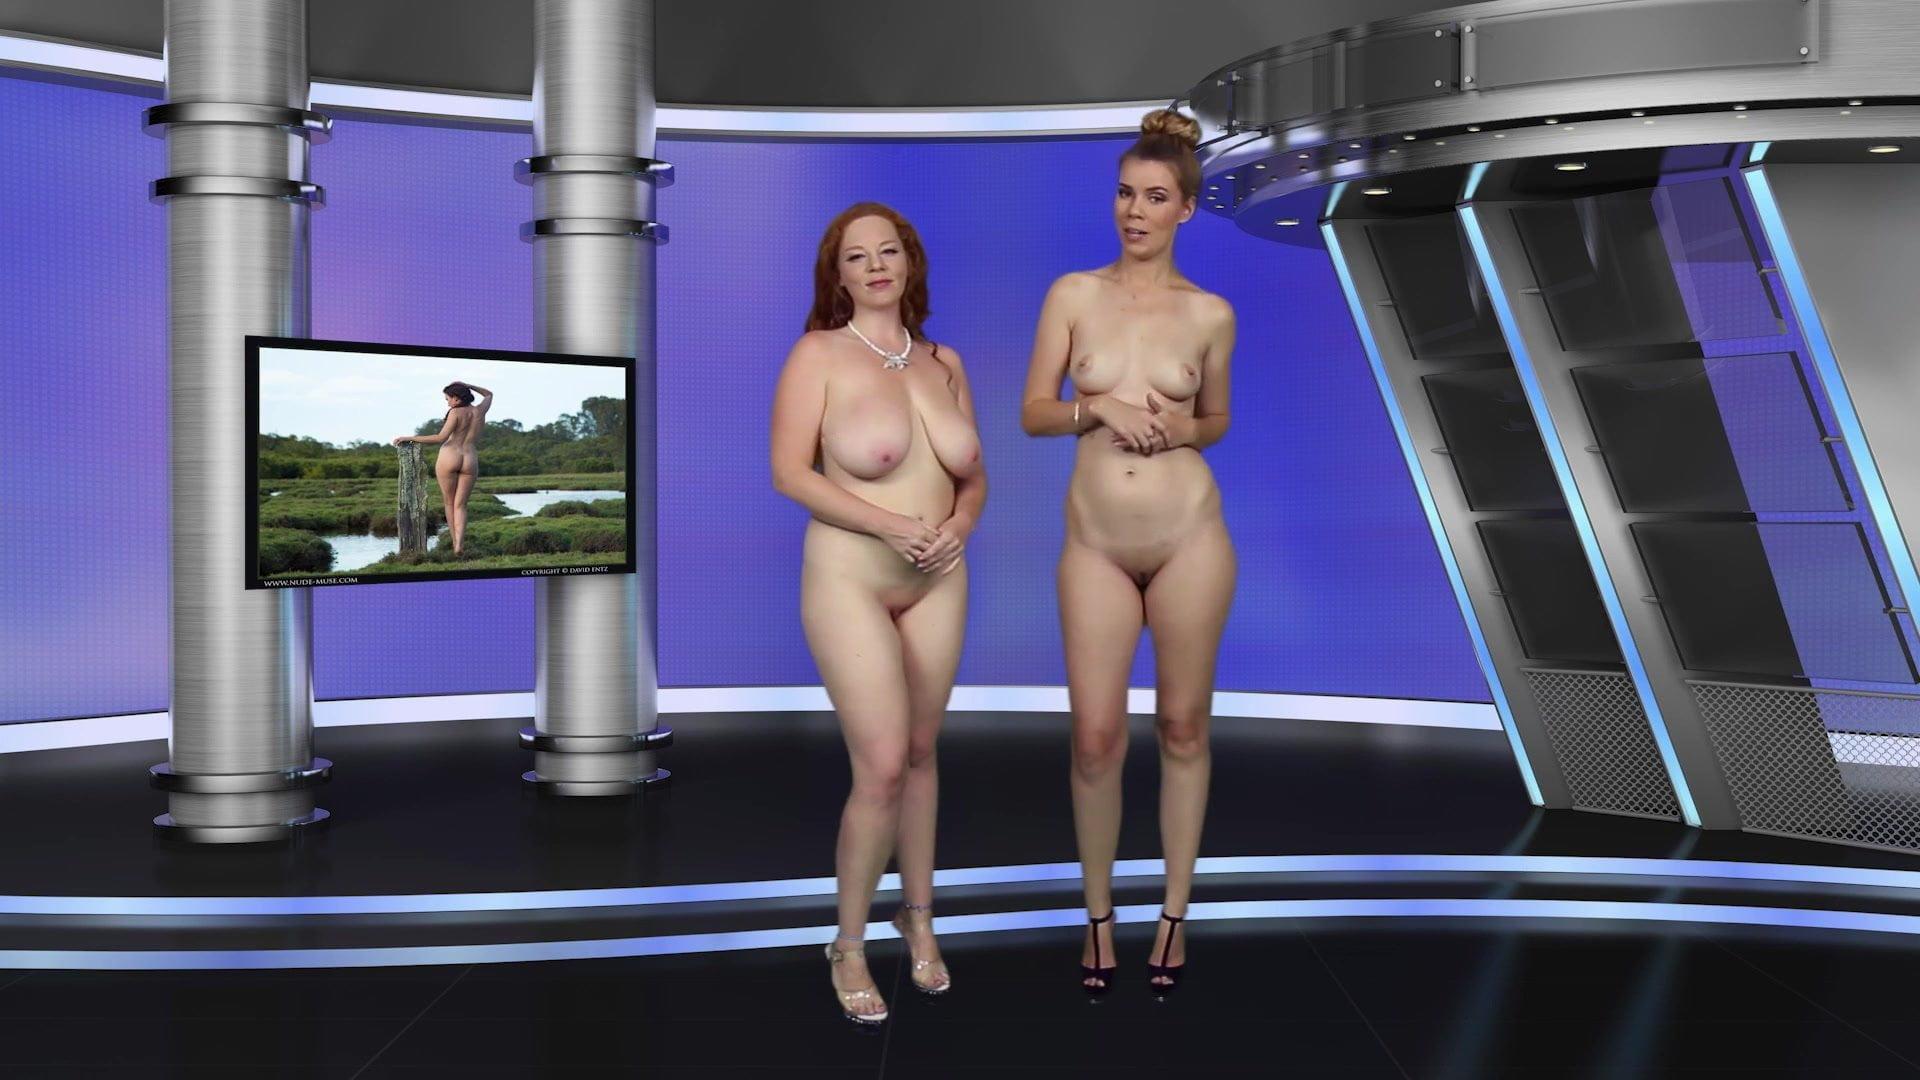 Xvideos Com Naked News Голые Сиськи